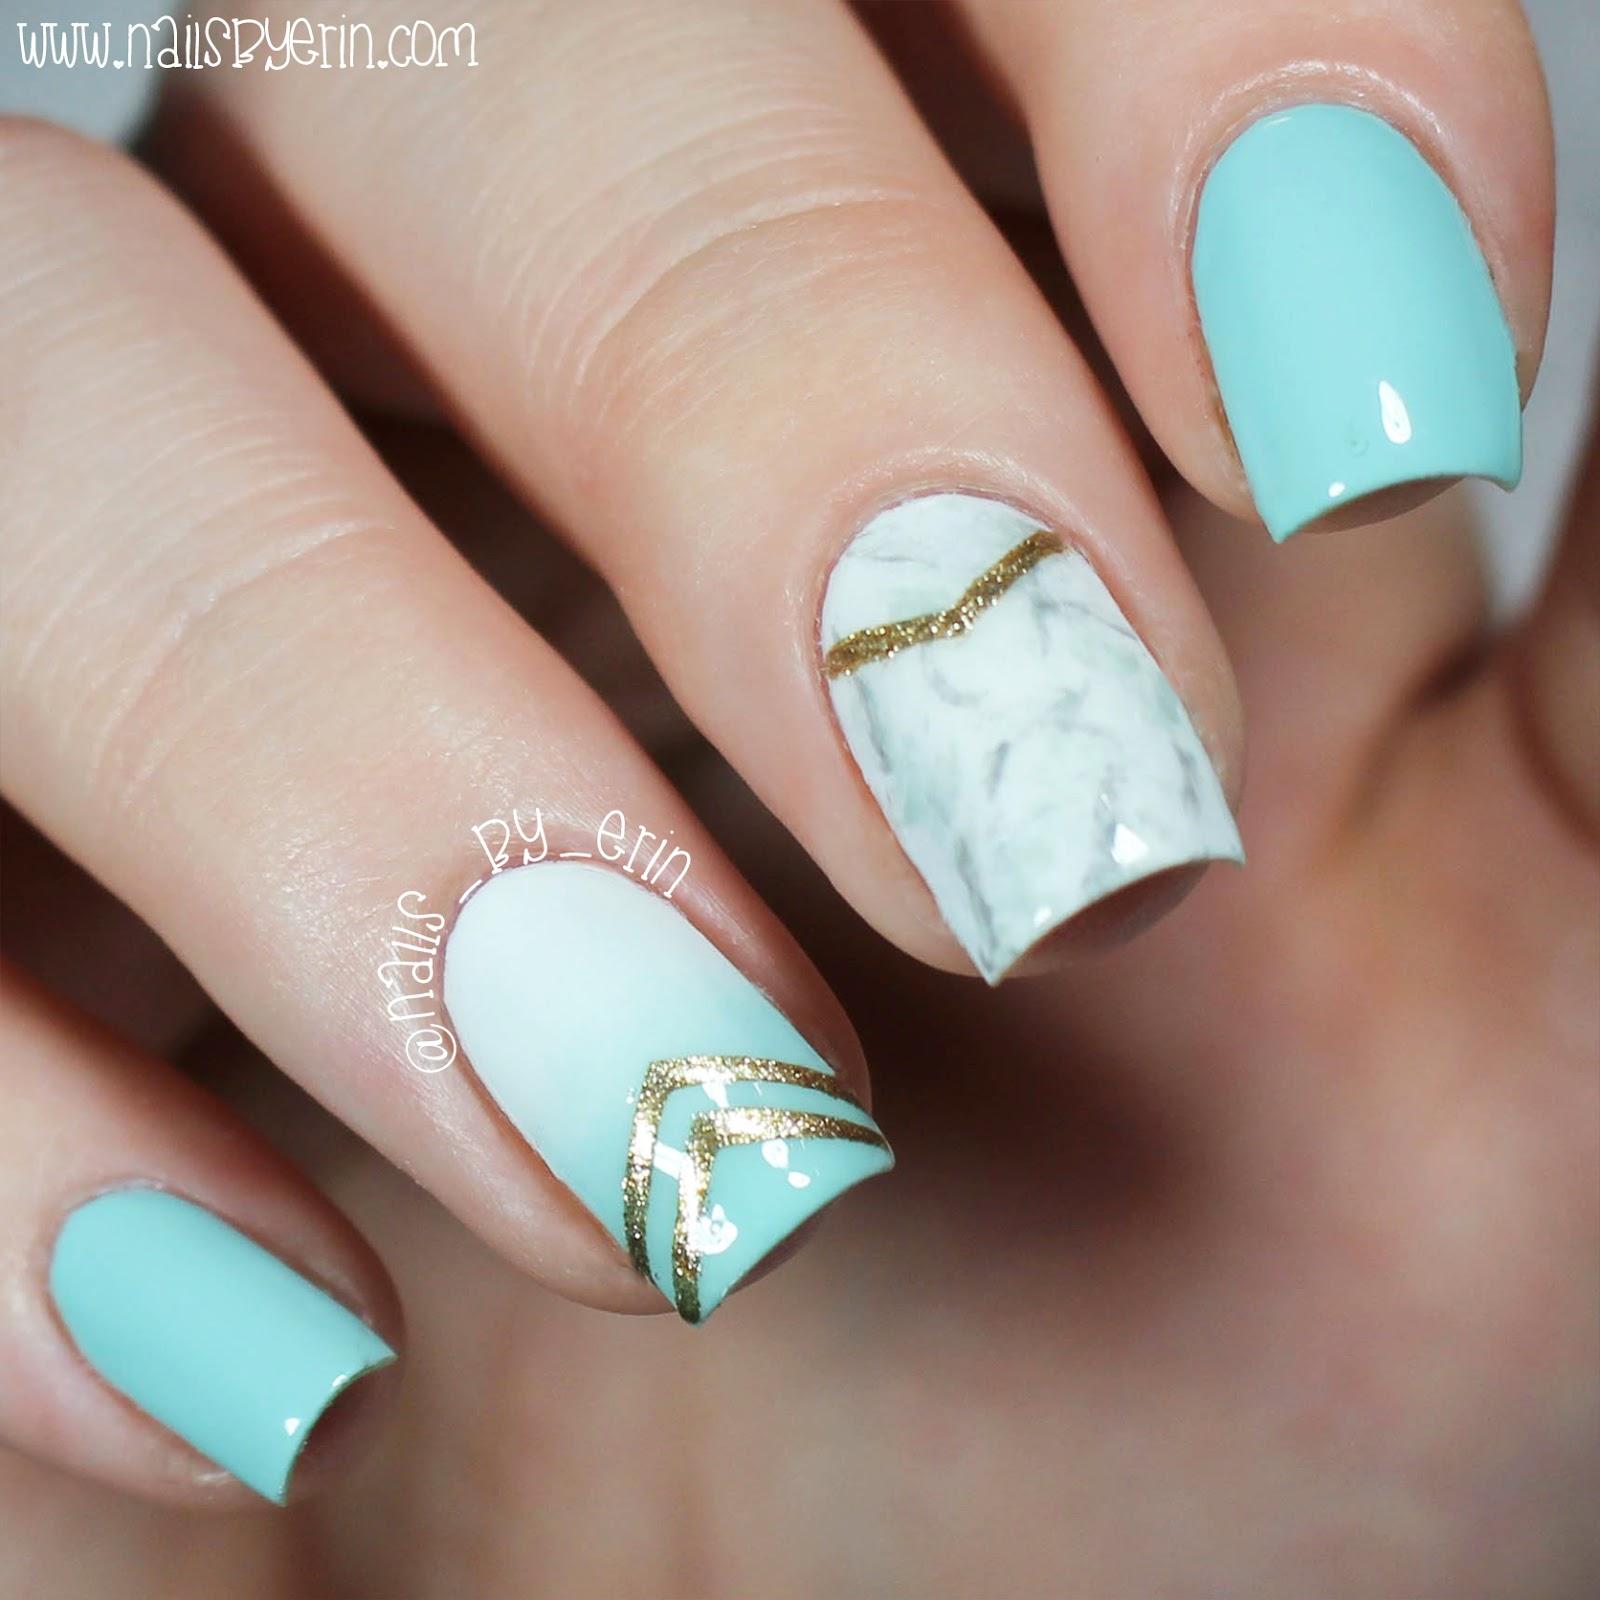 NailsByErin: Marble Effect Nails